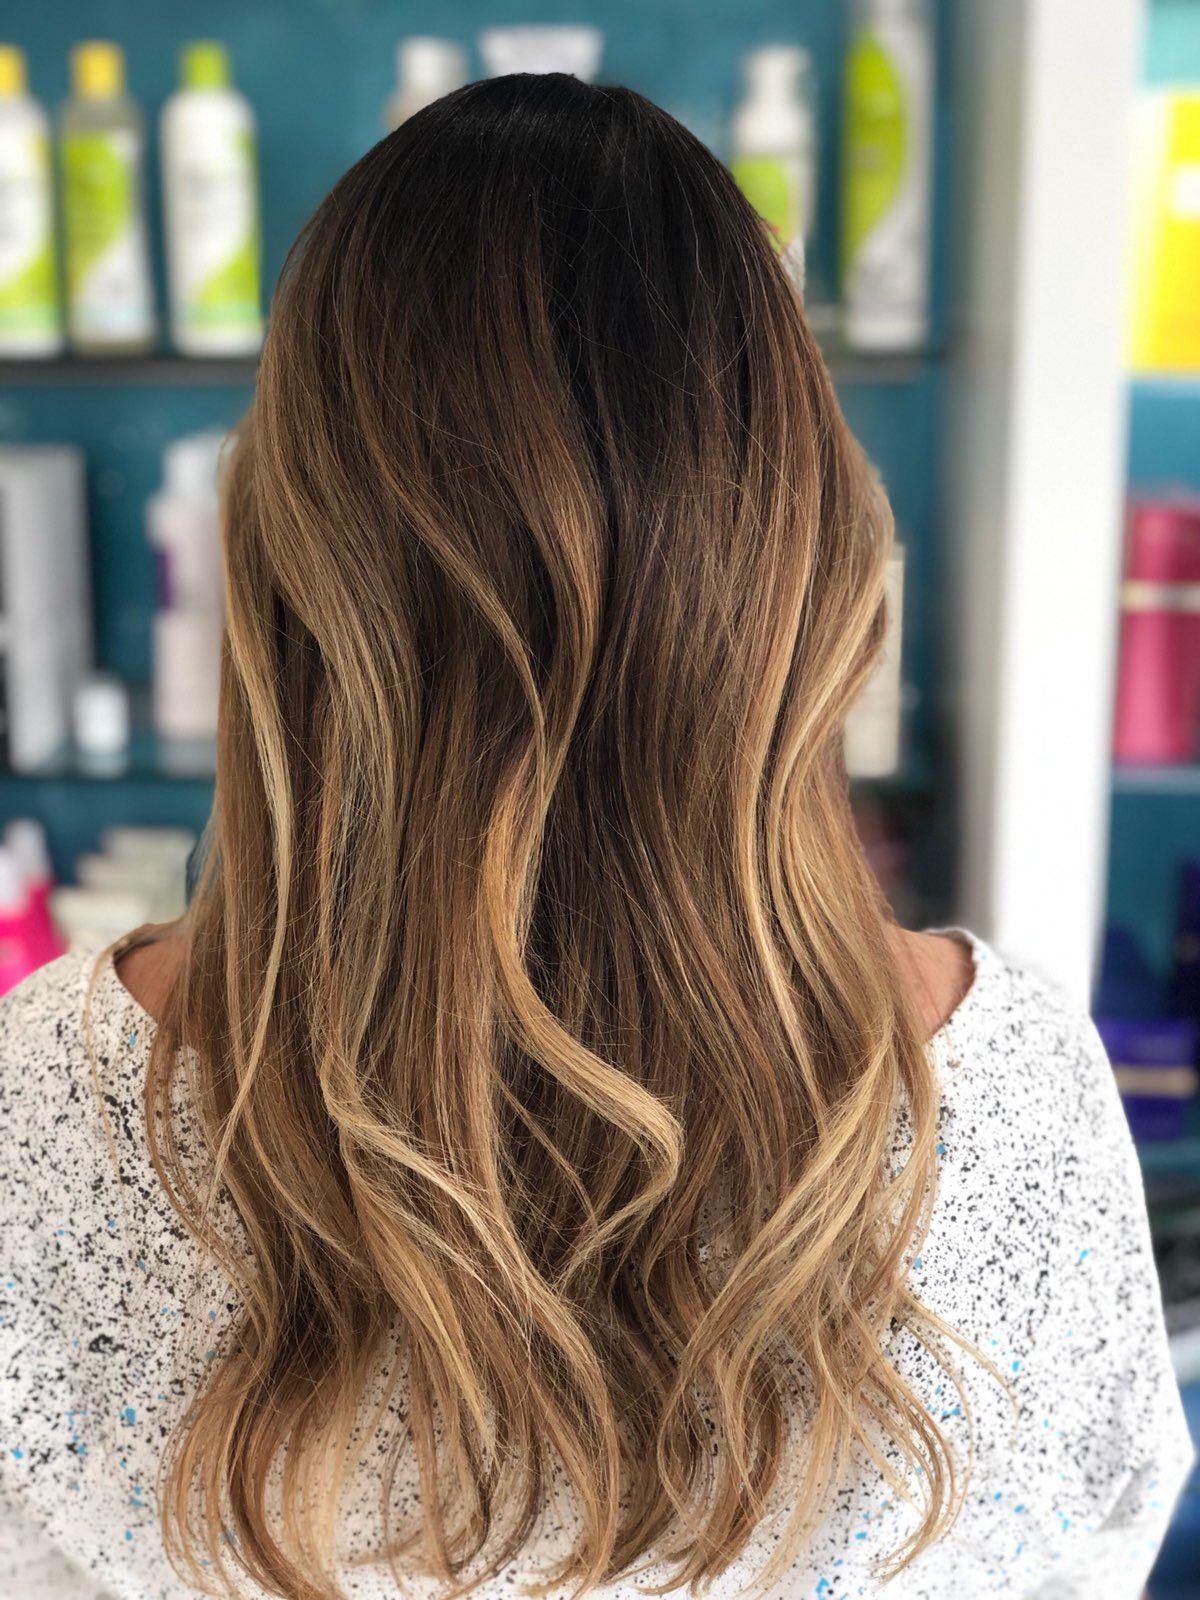 Ombre By Danielle Studio 10 Boca Raton Great Haircuts Long Hair Styles Hair Treatment